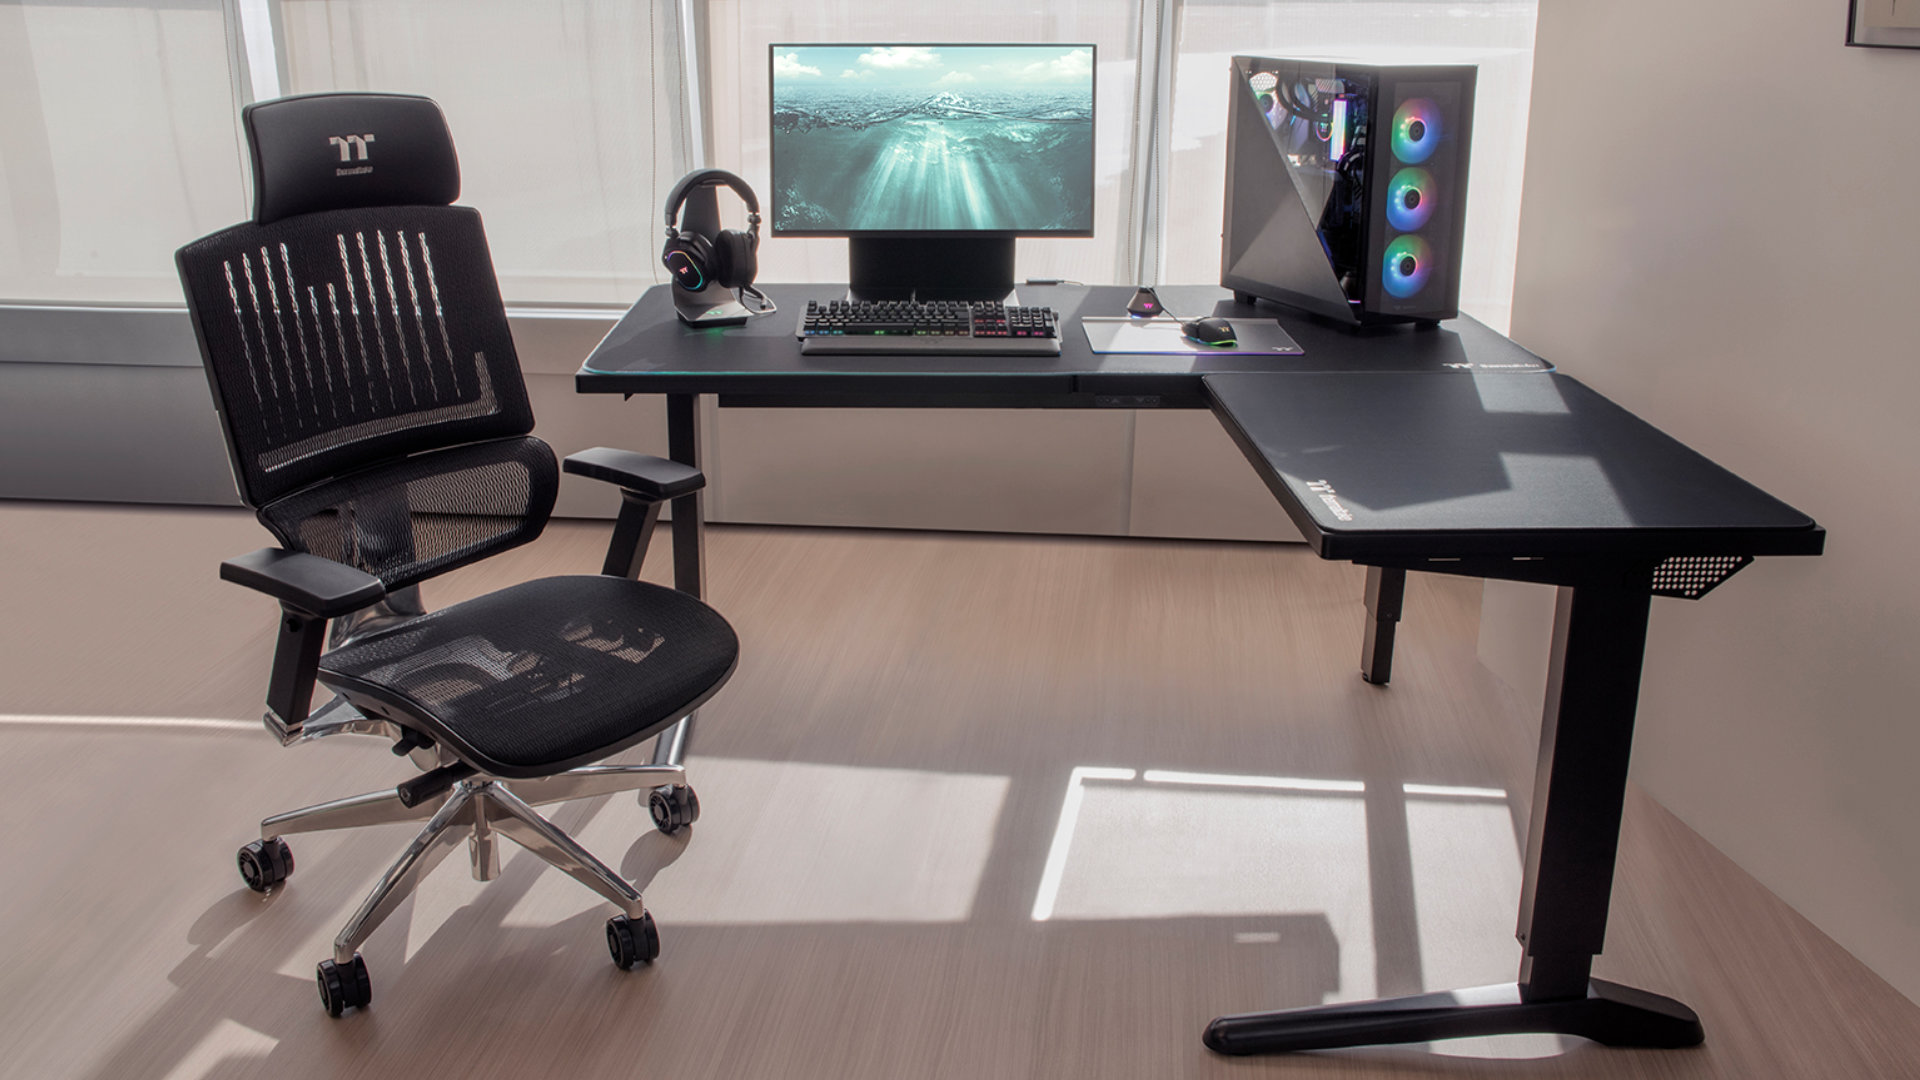 Best gaming desk in 2021